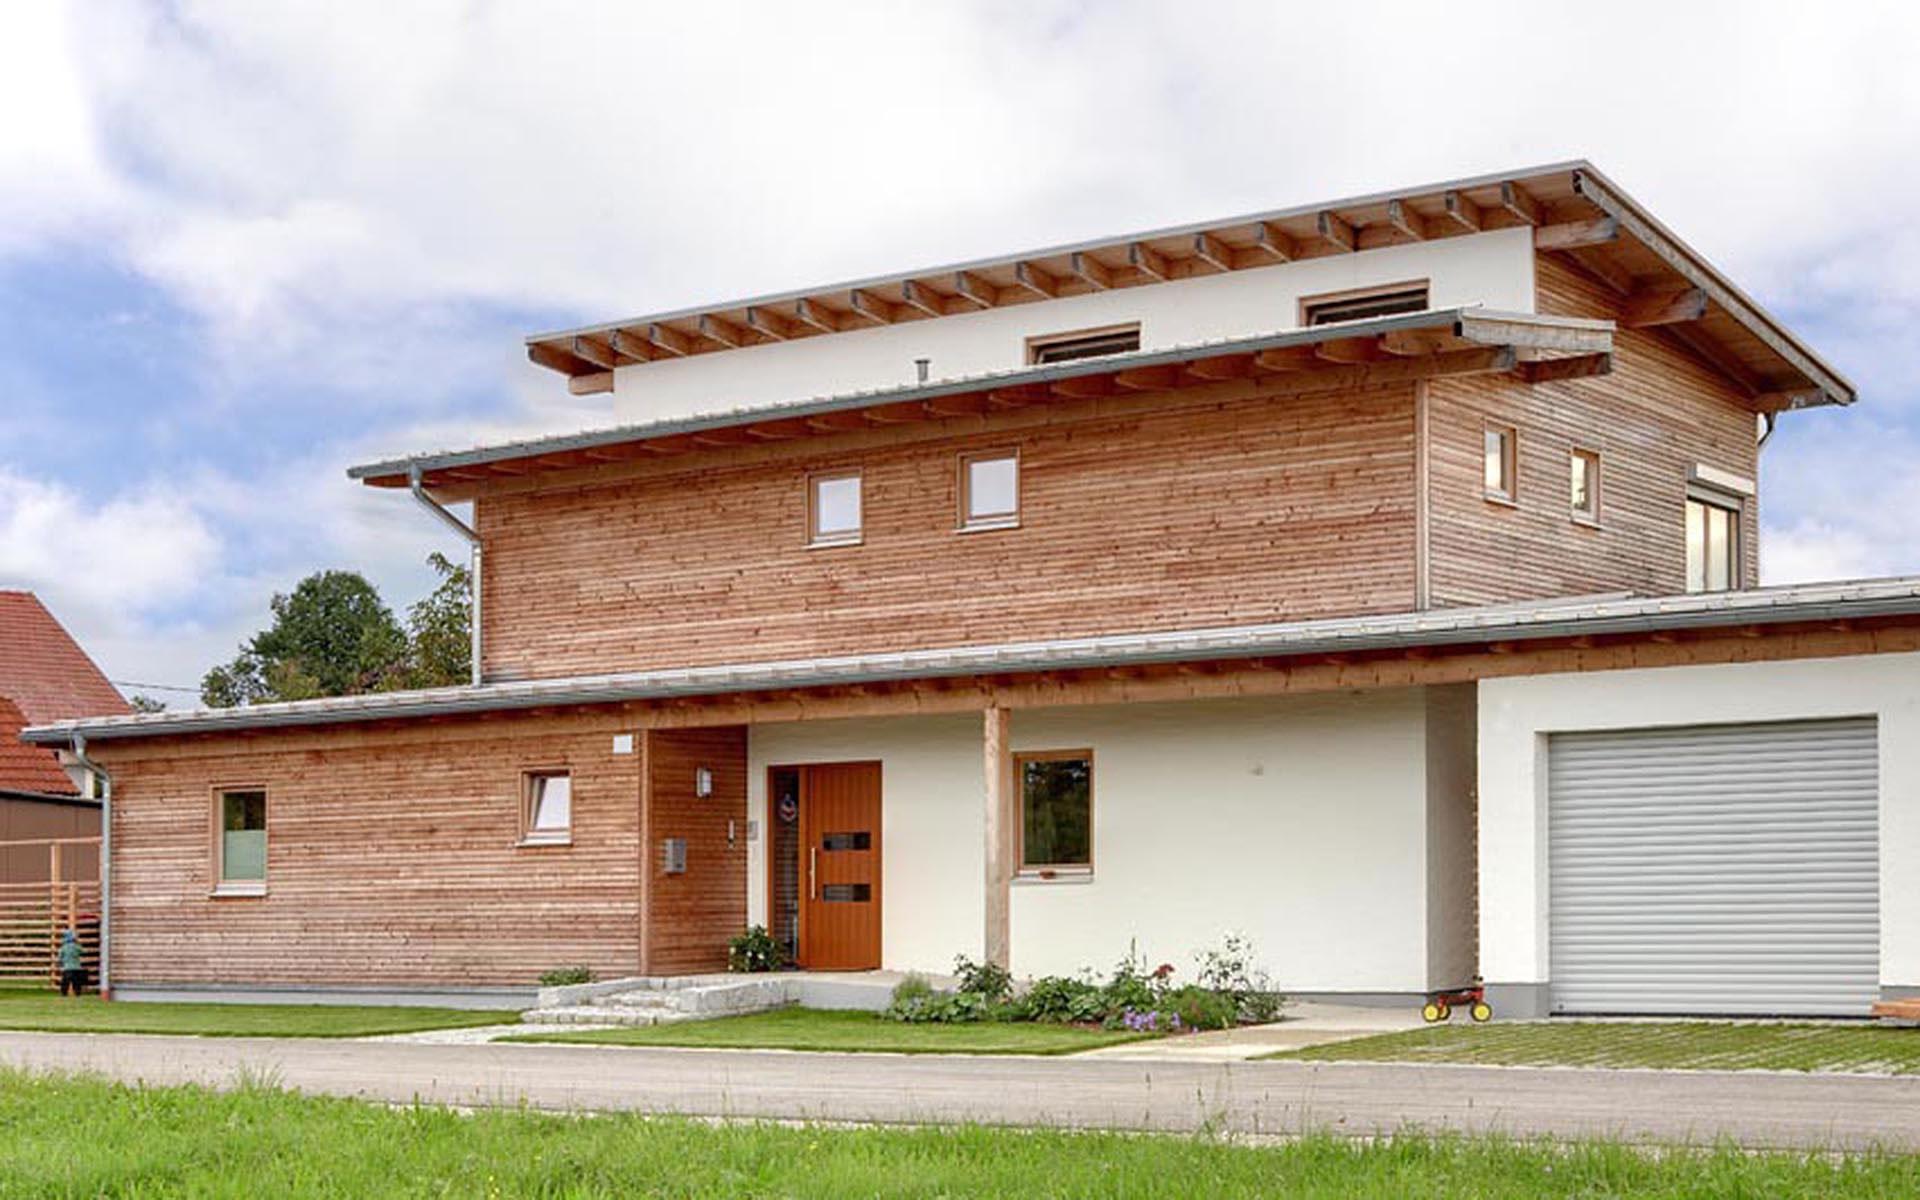 Attersee von Sonnleitner Holzbauwerke GmbH & Co. KG